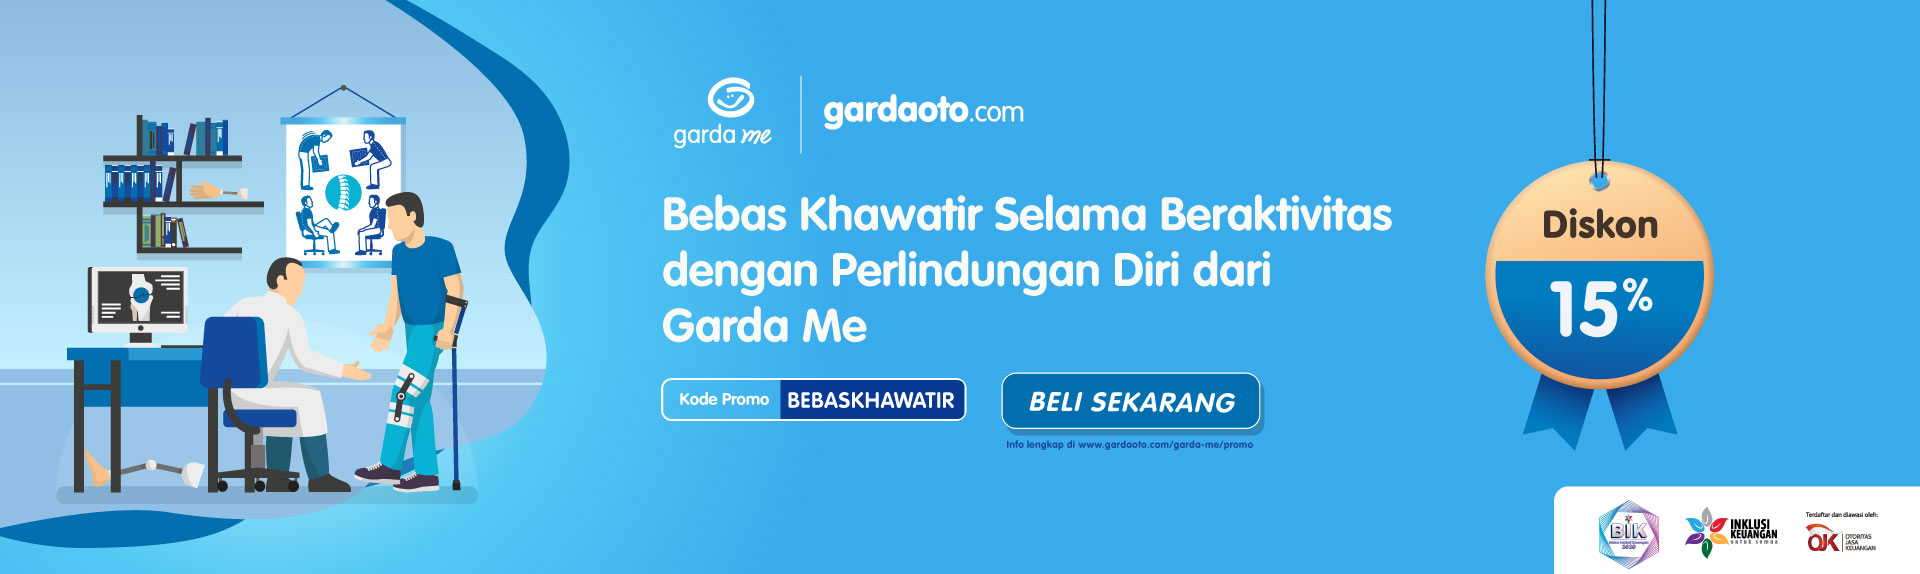 Promo Garda Me Oktober 2020 - gardaoto.com